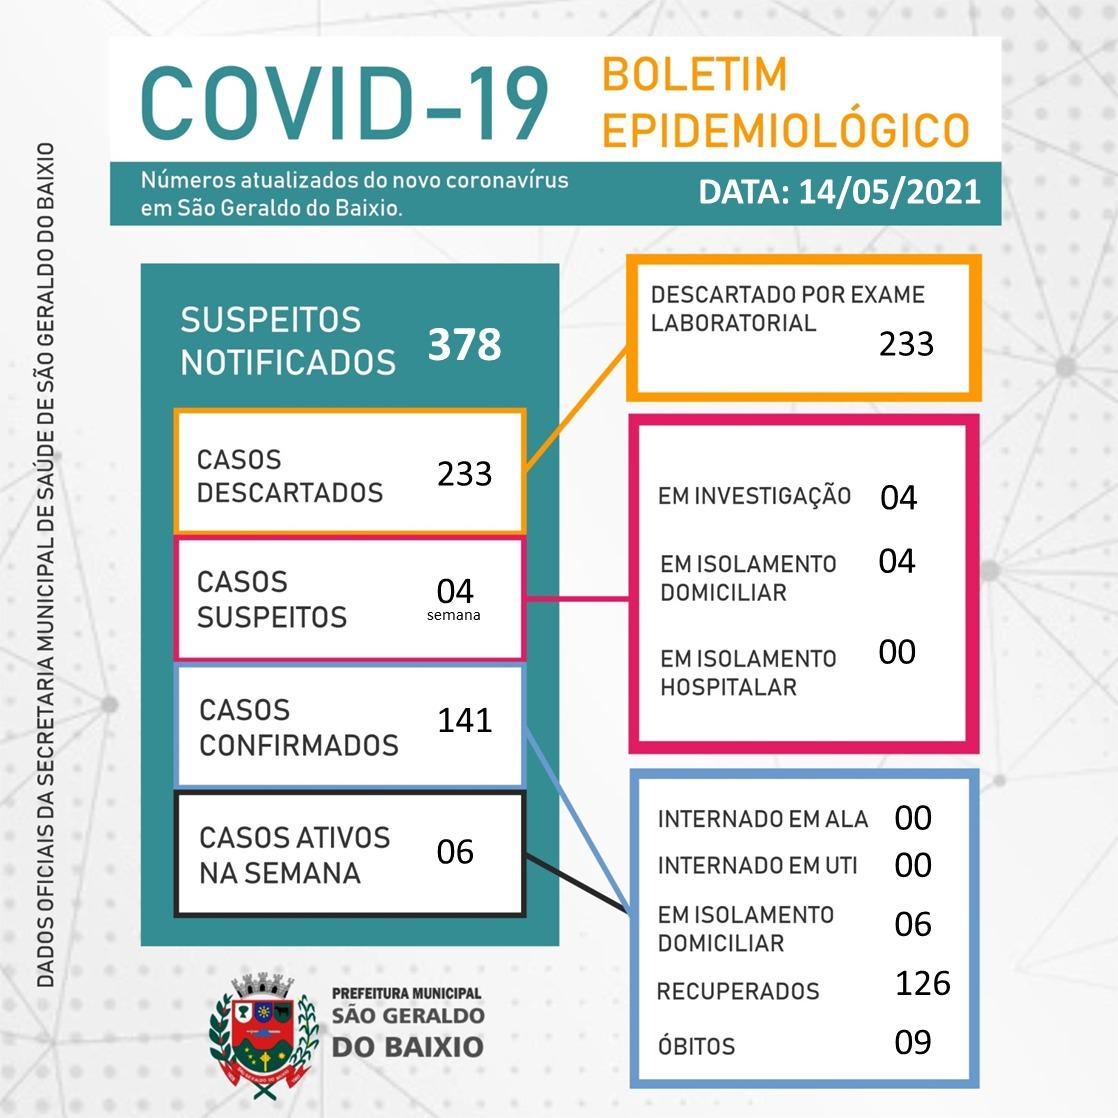 BOLETIM EPIDEMIOLÓGICO 14/05/2021